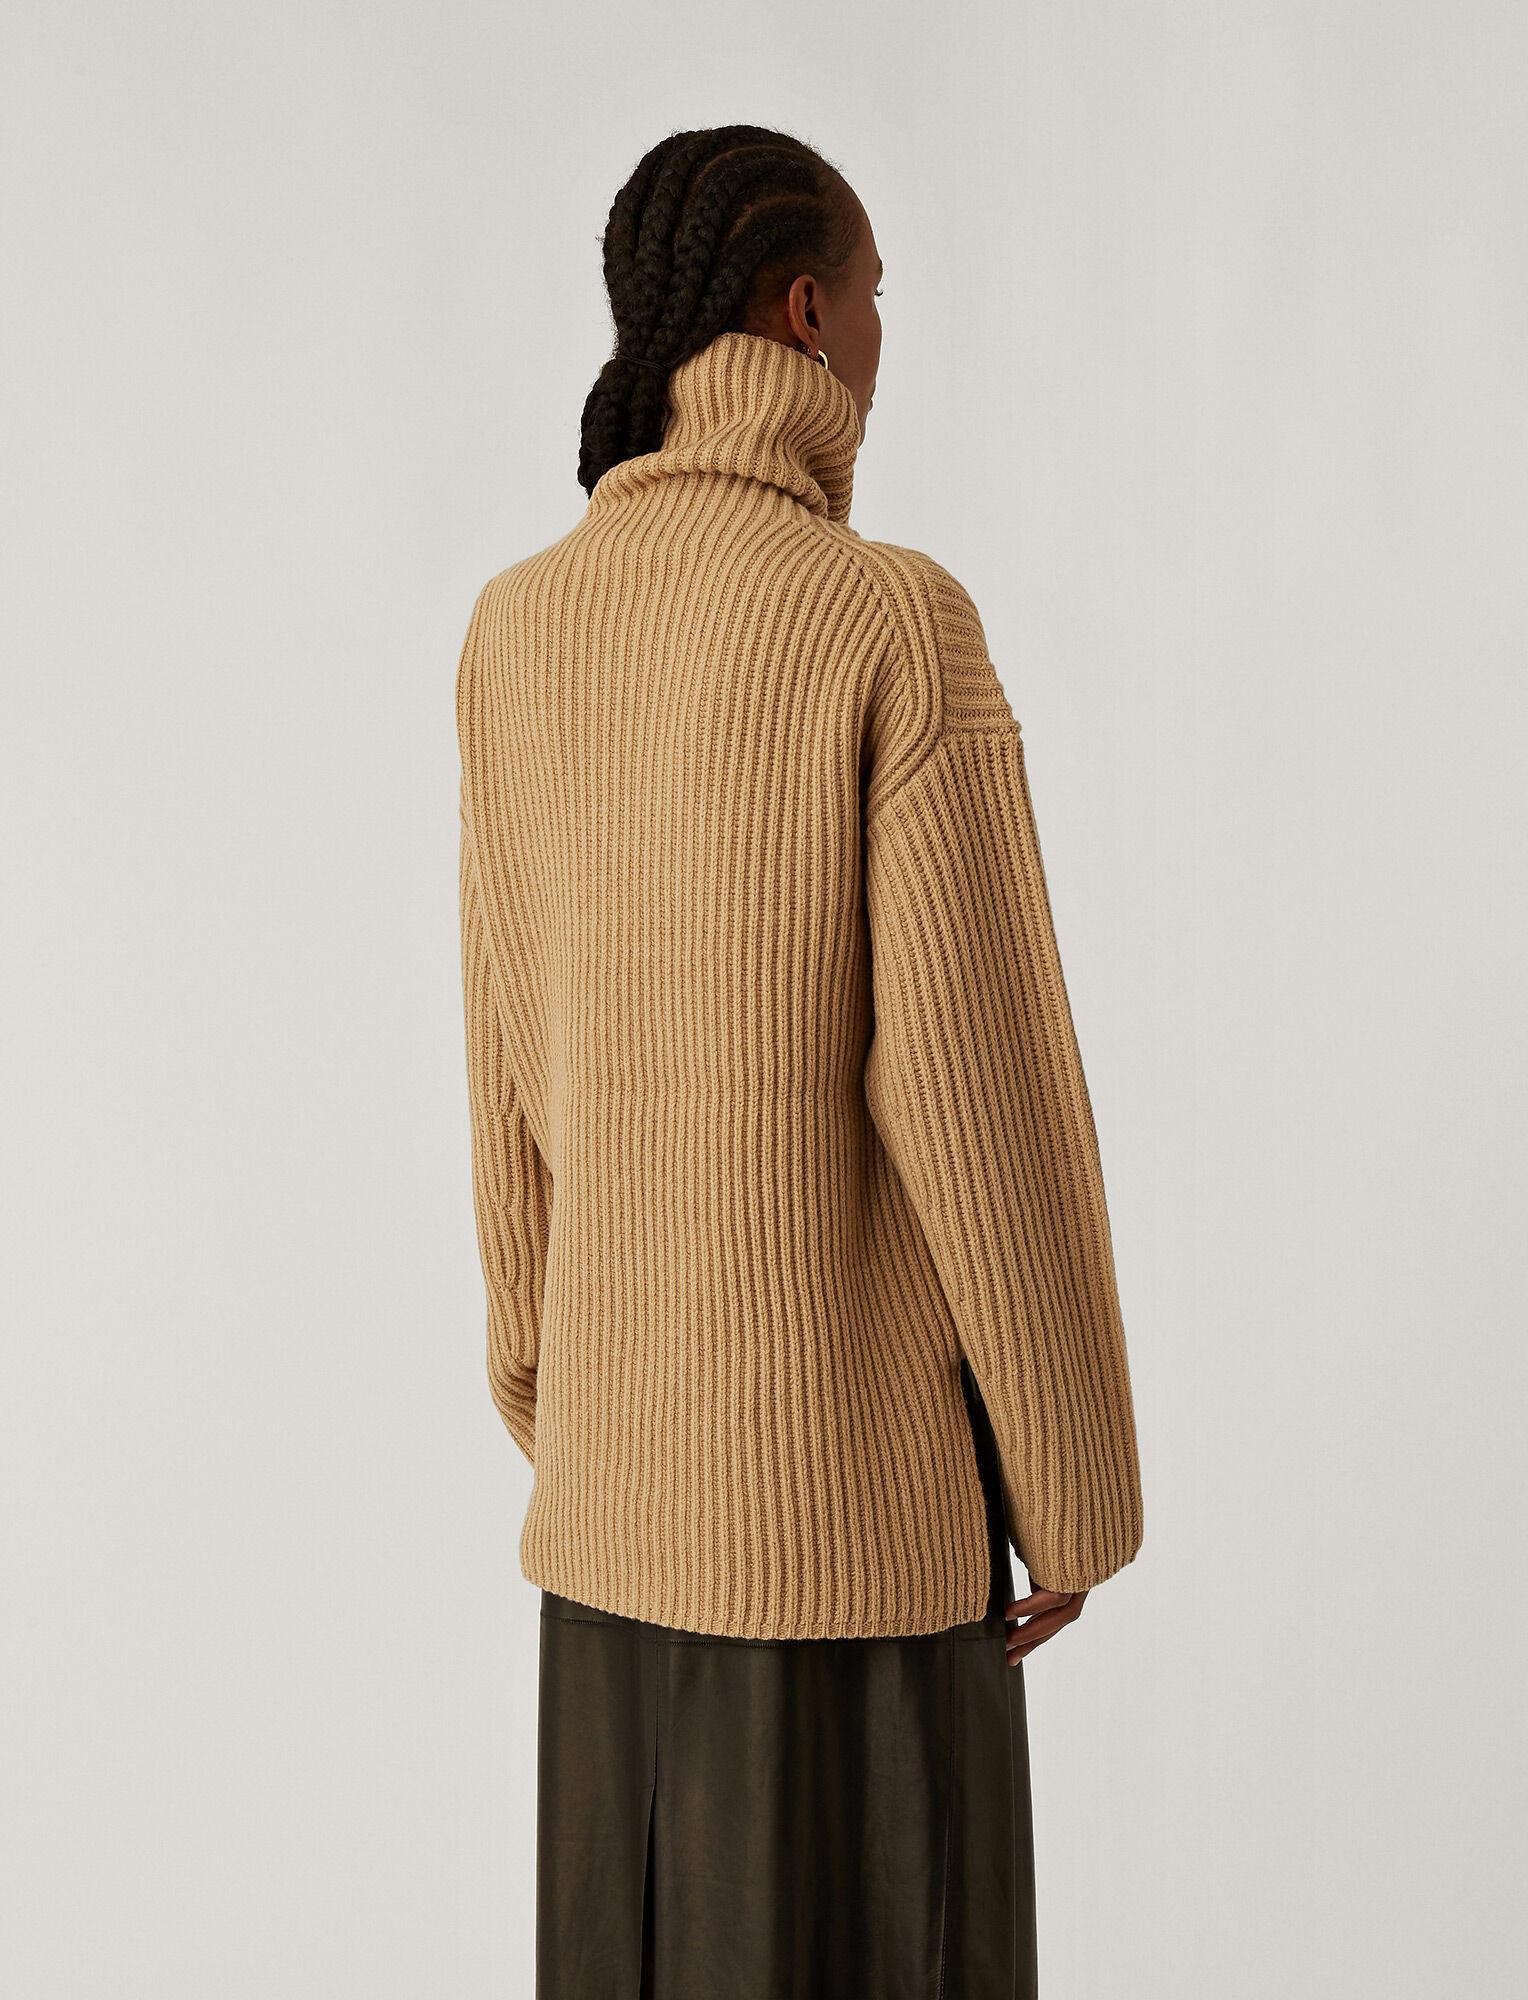 Joseph, High Neck Chunky Knit, in Light Cognac